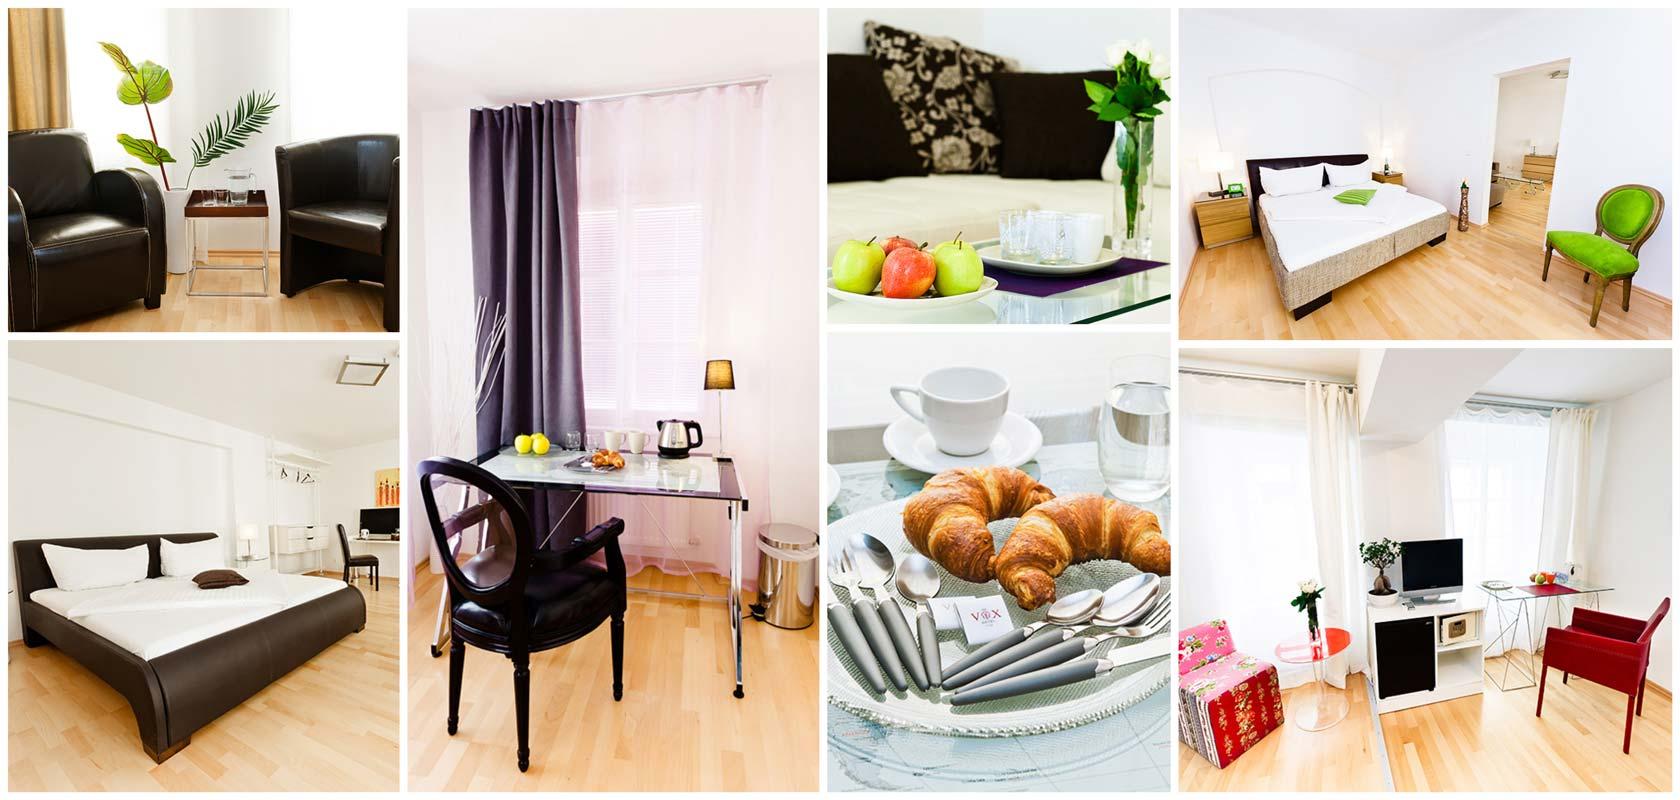 Vox Apartment Hotel in Wien Leopoldstadt Collage